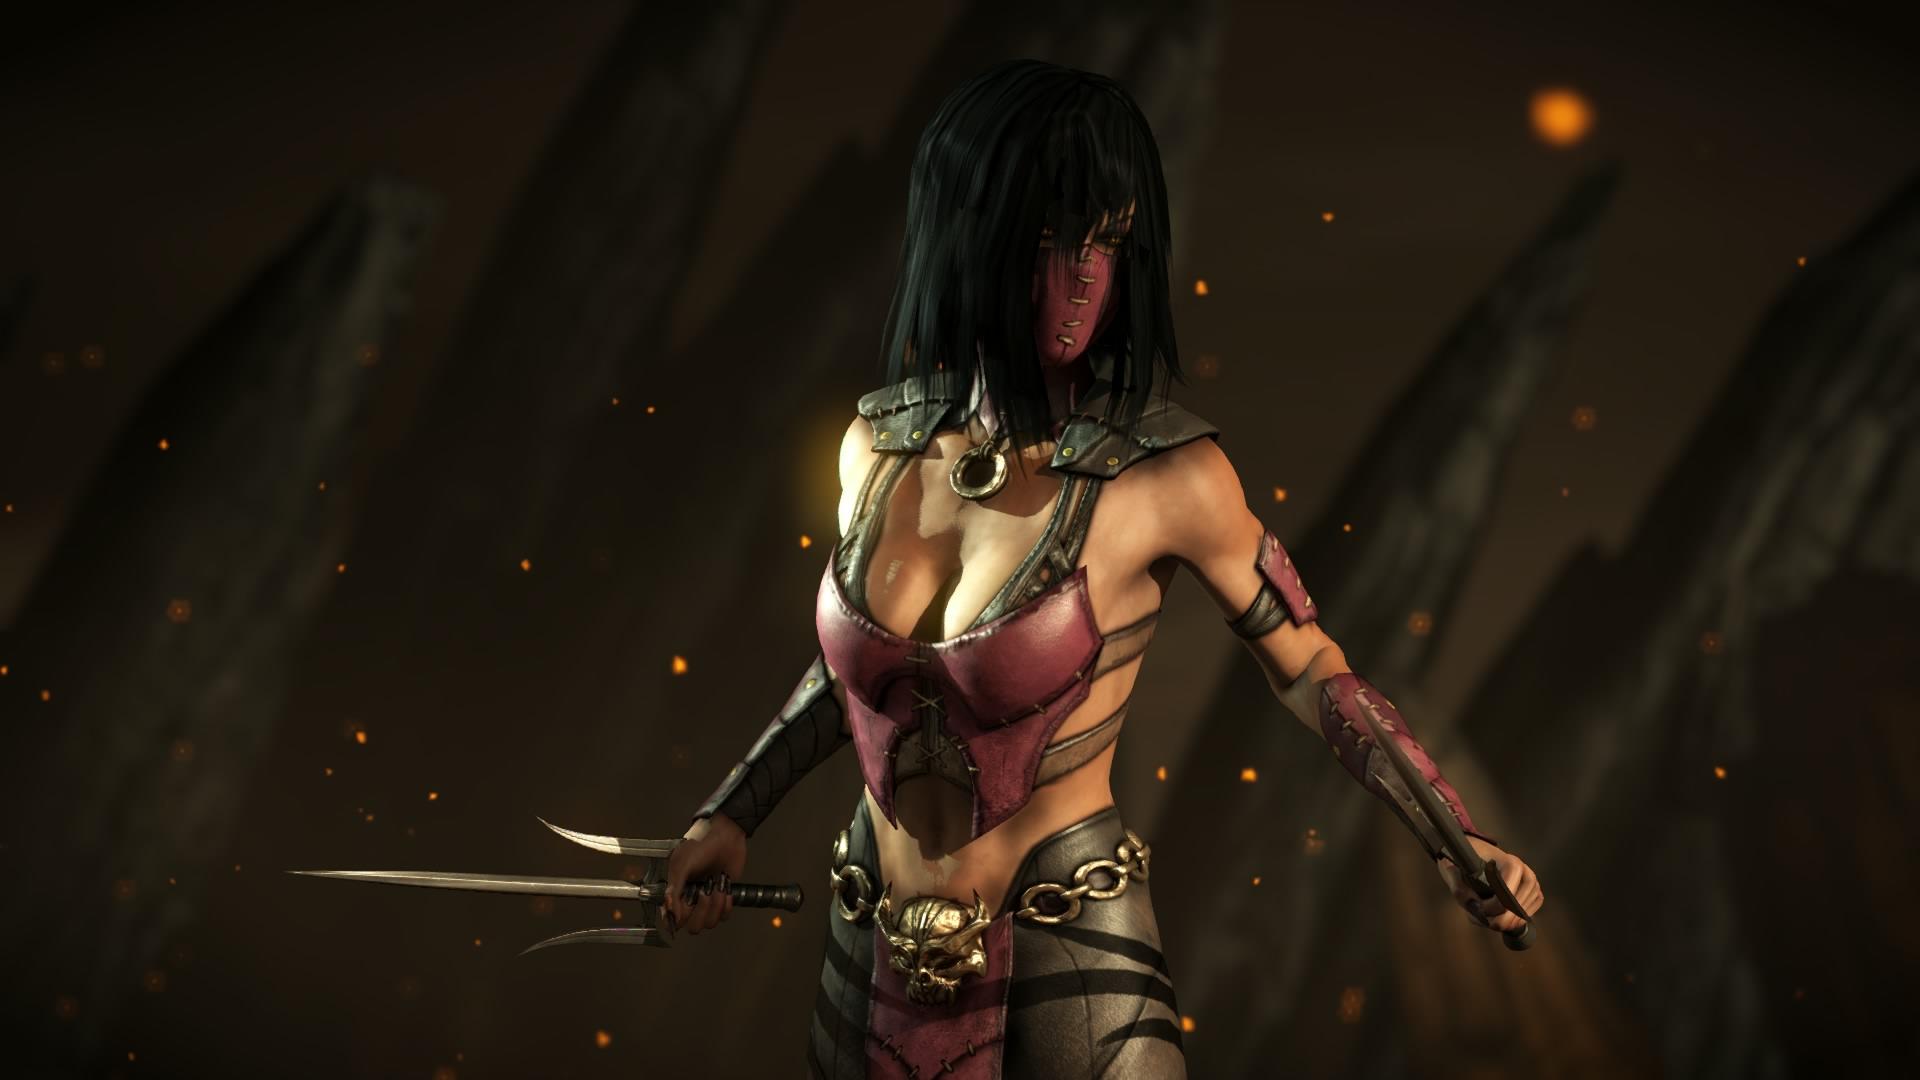 Mortal Kombat XMileena Kahnum costume by Kabukiart on DeviantArt